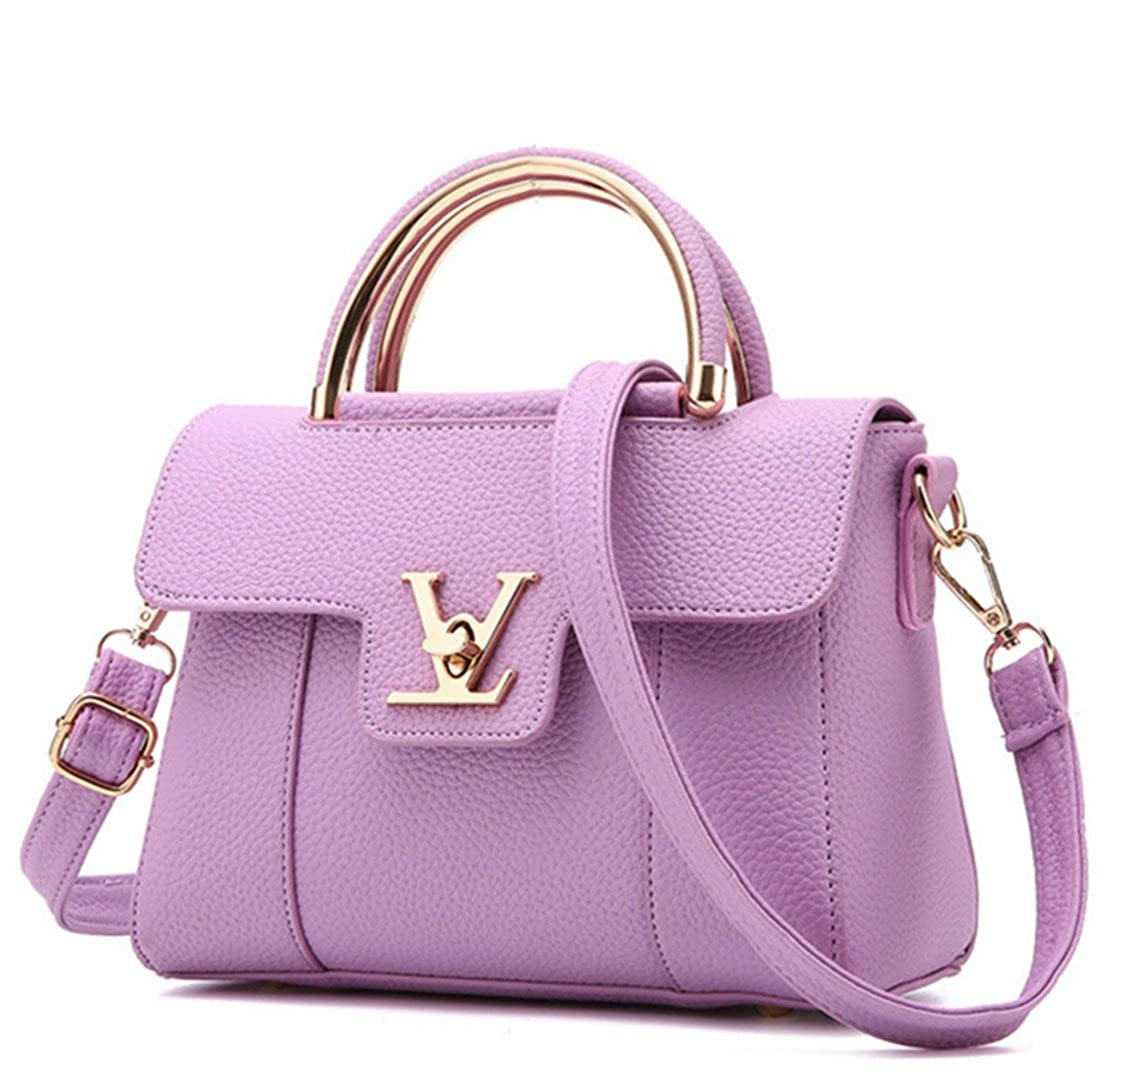 Amazon.com  Fake Designer Bags V Women s Luxury Leather Clutch Bag Ladies  Handbags Brand Women Messenger Bags Sac A Main Femme Handle 6  Luggage  combination ... 0e133f8ca0ac7